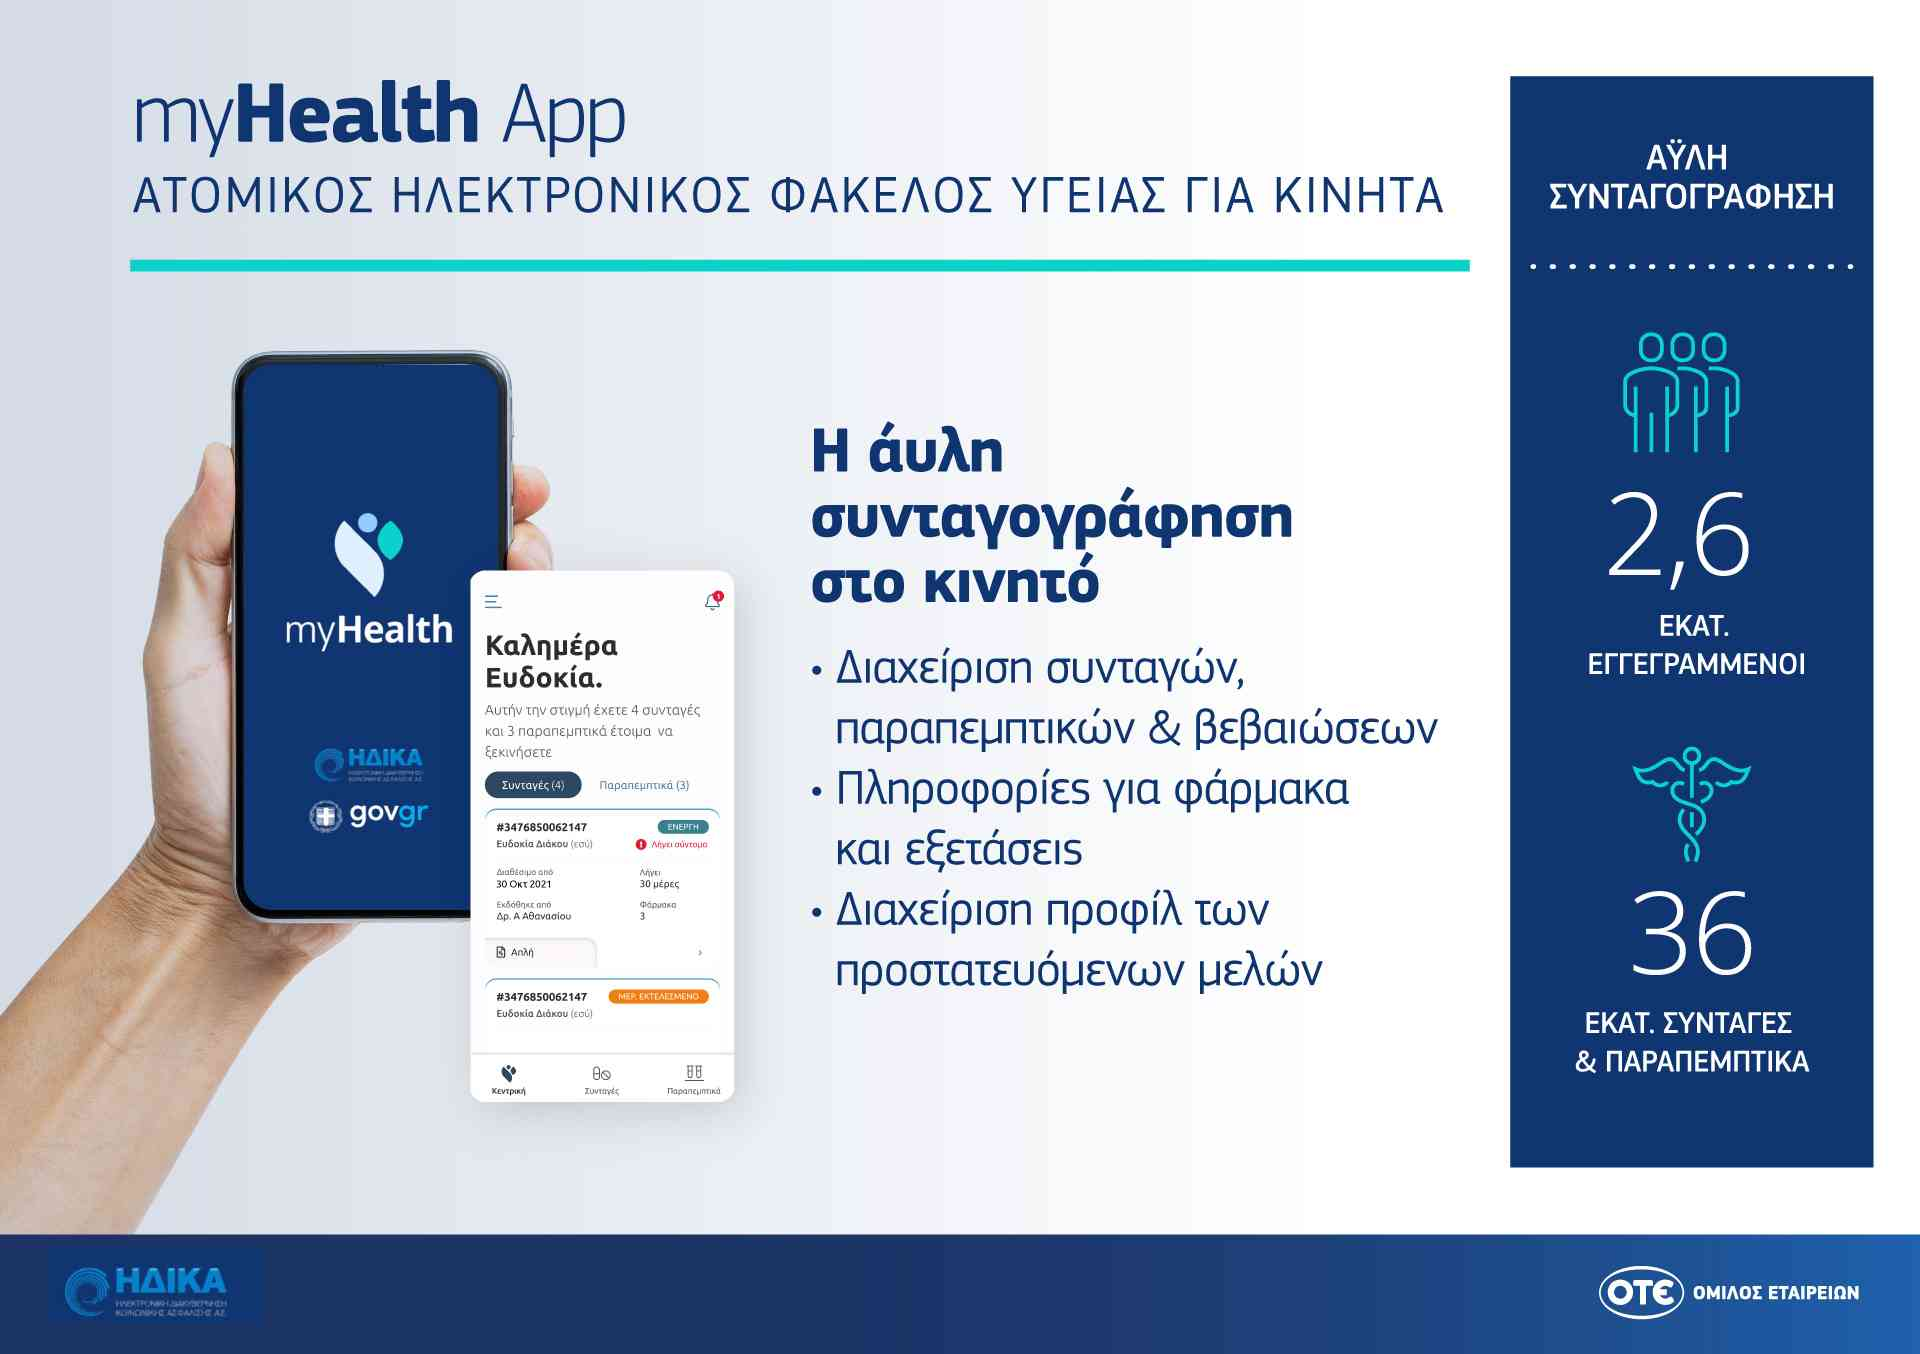 myHealth app: η «Άυλη Συνταγογράφηση» στο κινητό από τον Όμιλο ΟΤΕ για την Η.ΔΙ.ΚΑ